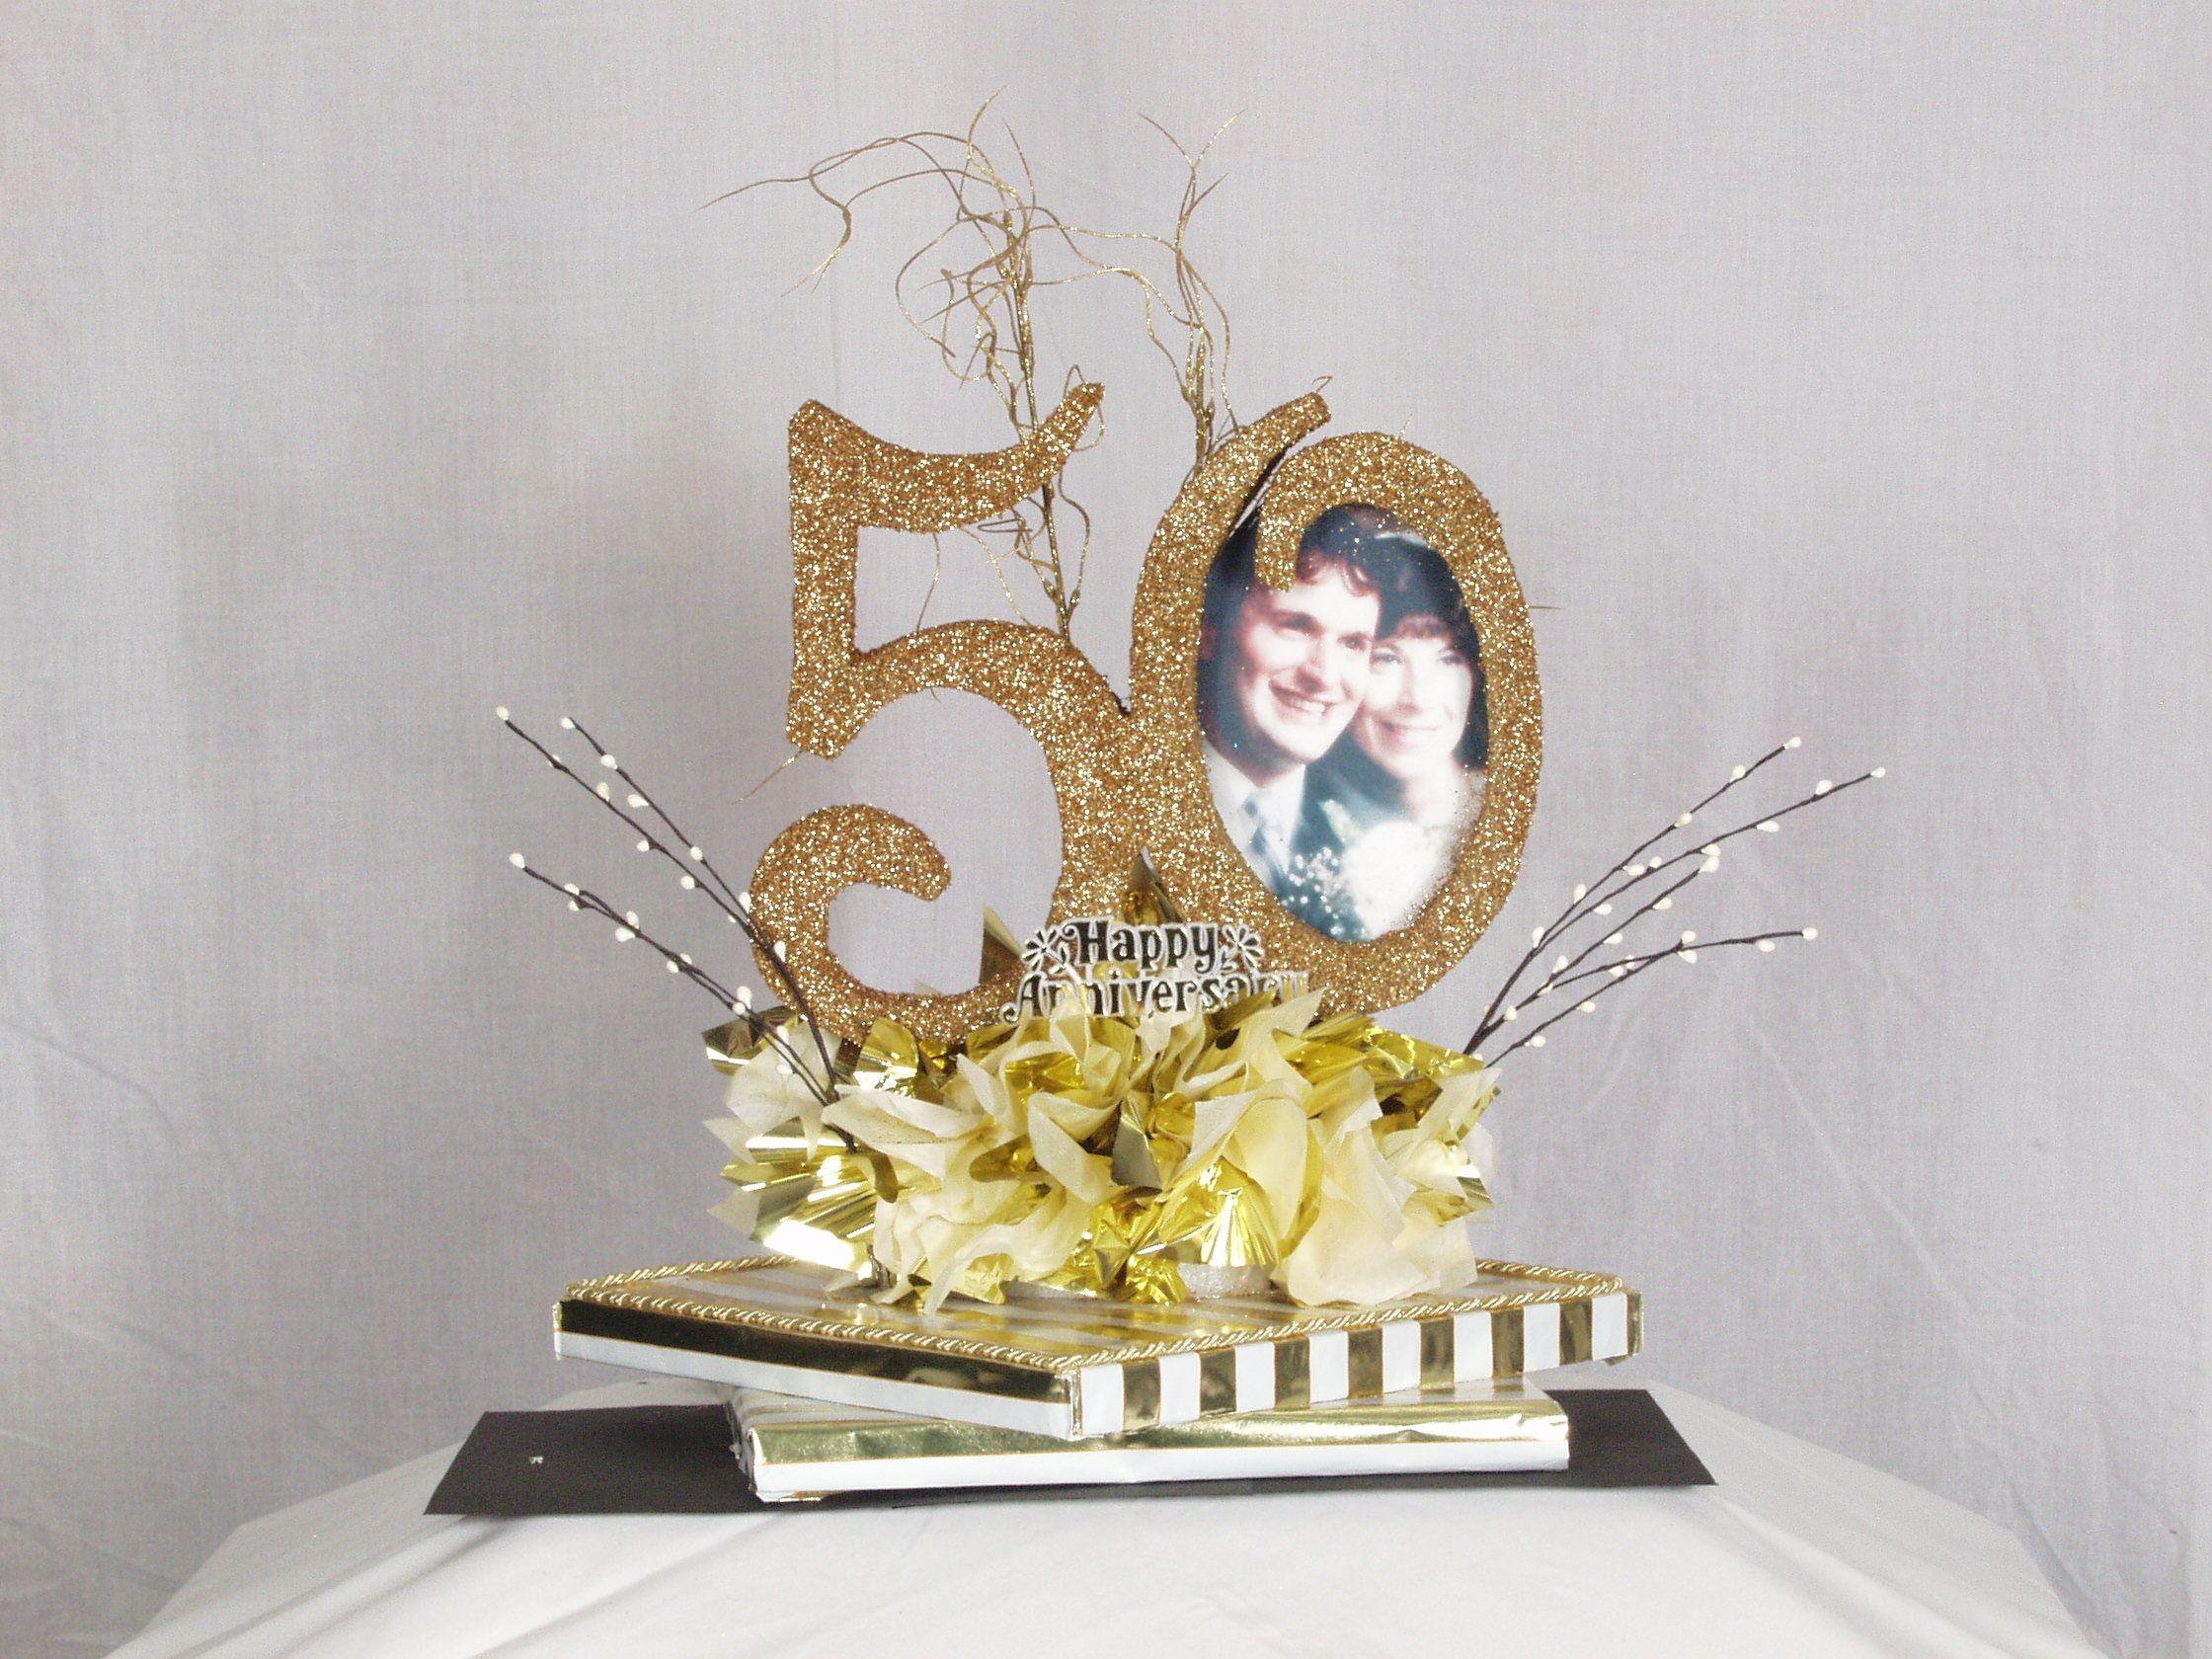 50th anniversary centerpiece craft ideas pinterest for Decoration 50th anniversary